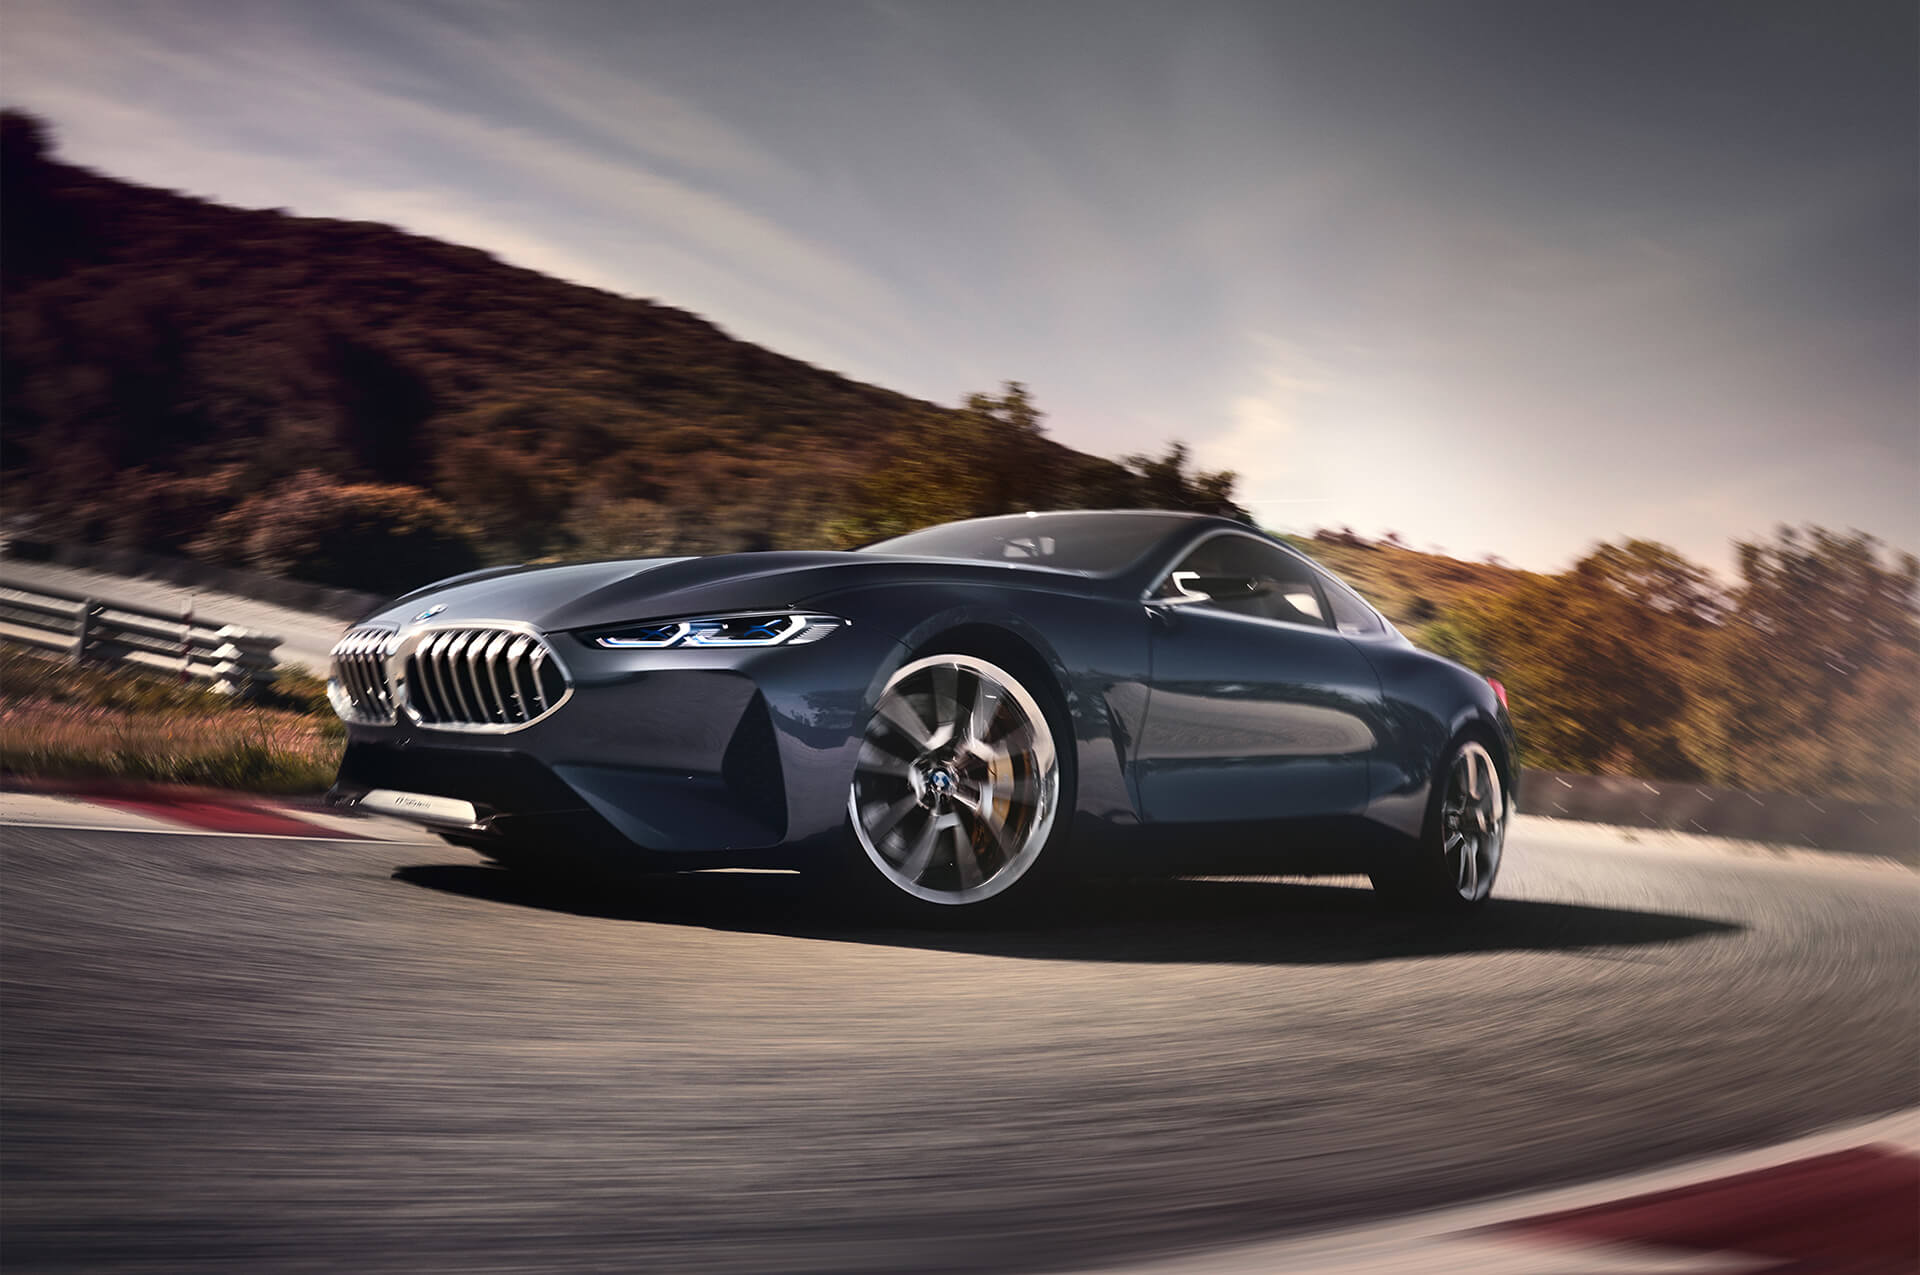 2018-BMW-Concept-8-Series TOP